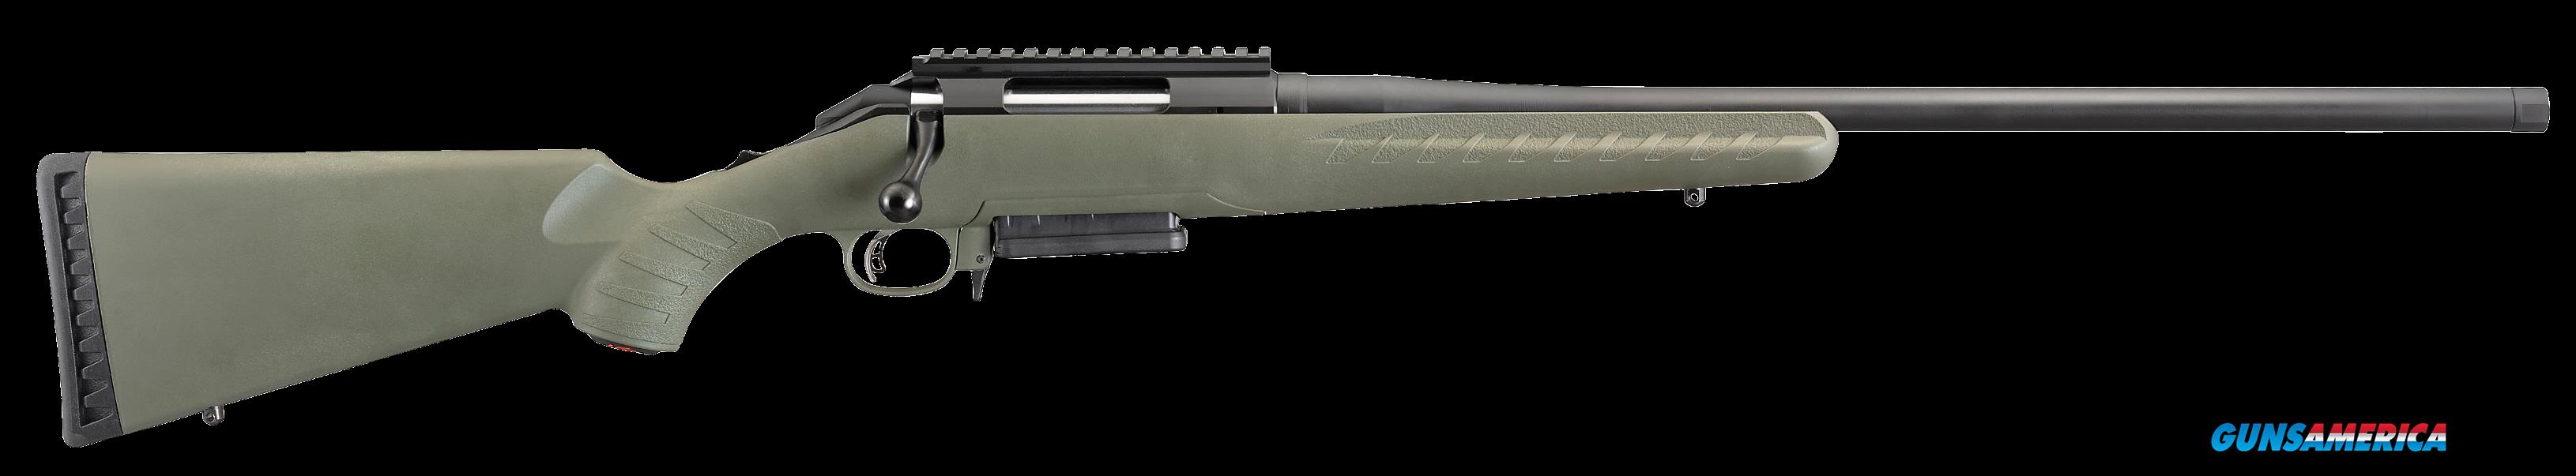 Ruger American, Rug 26944 Amer-p   223     22 Rail   Moss-blk  Guns > Pistols > 1911 Pistol Copies (non-Colt)